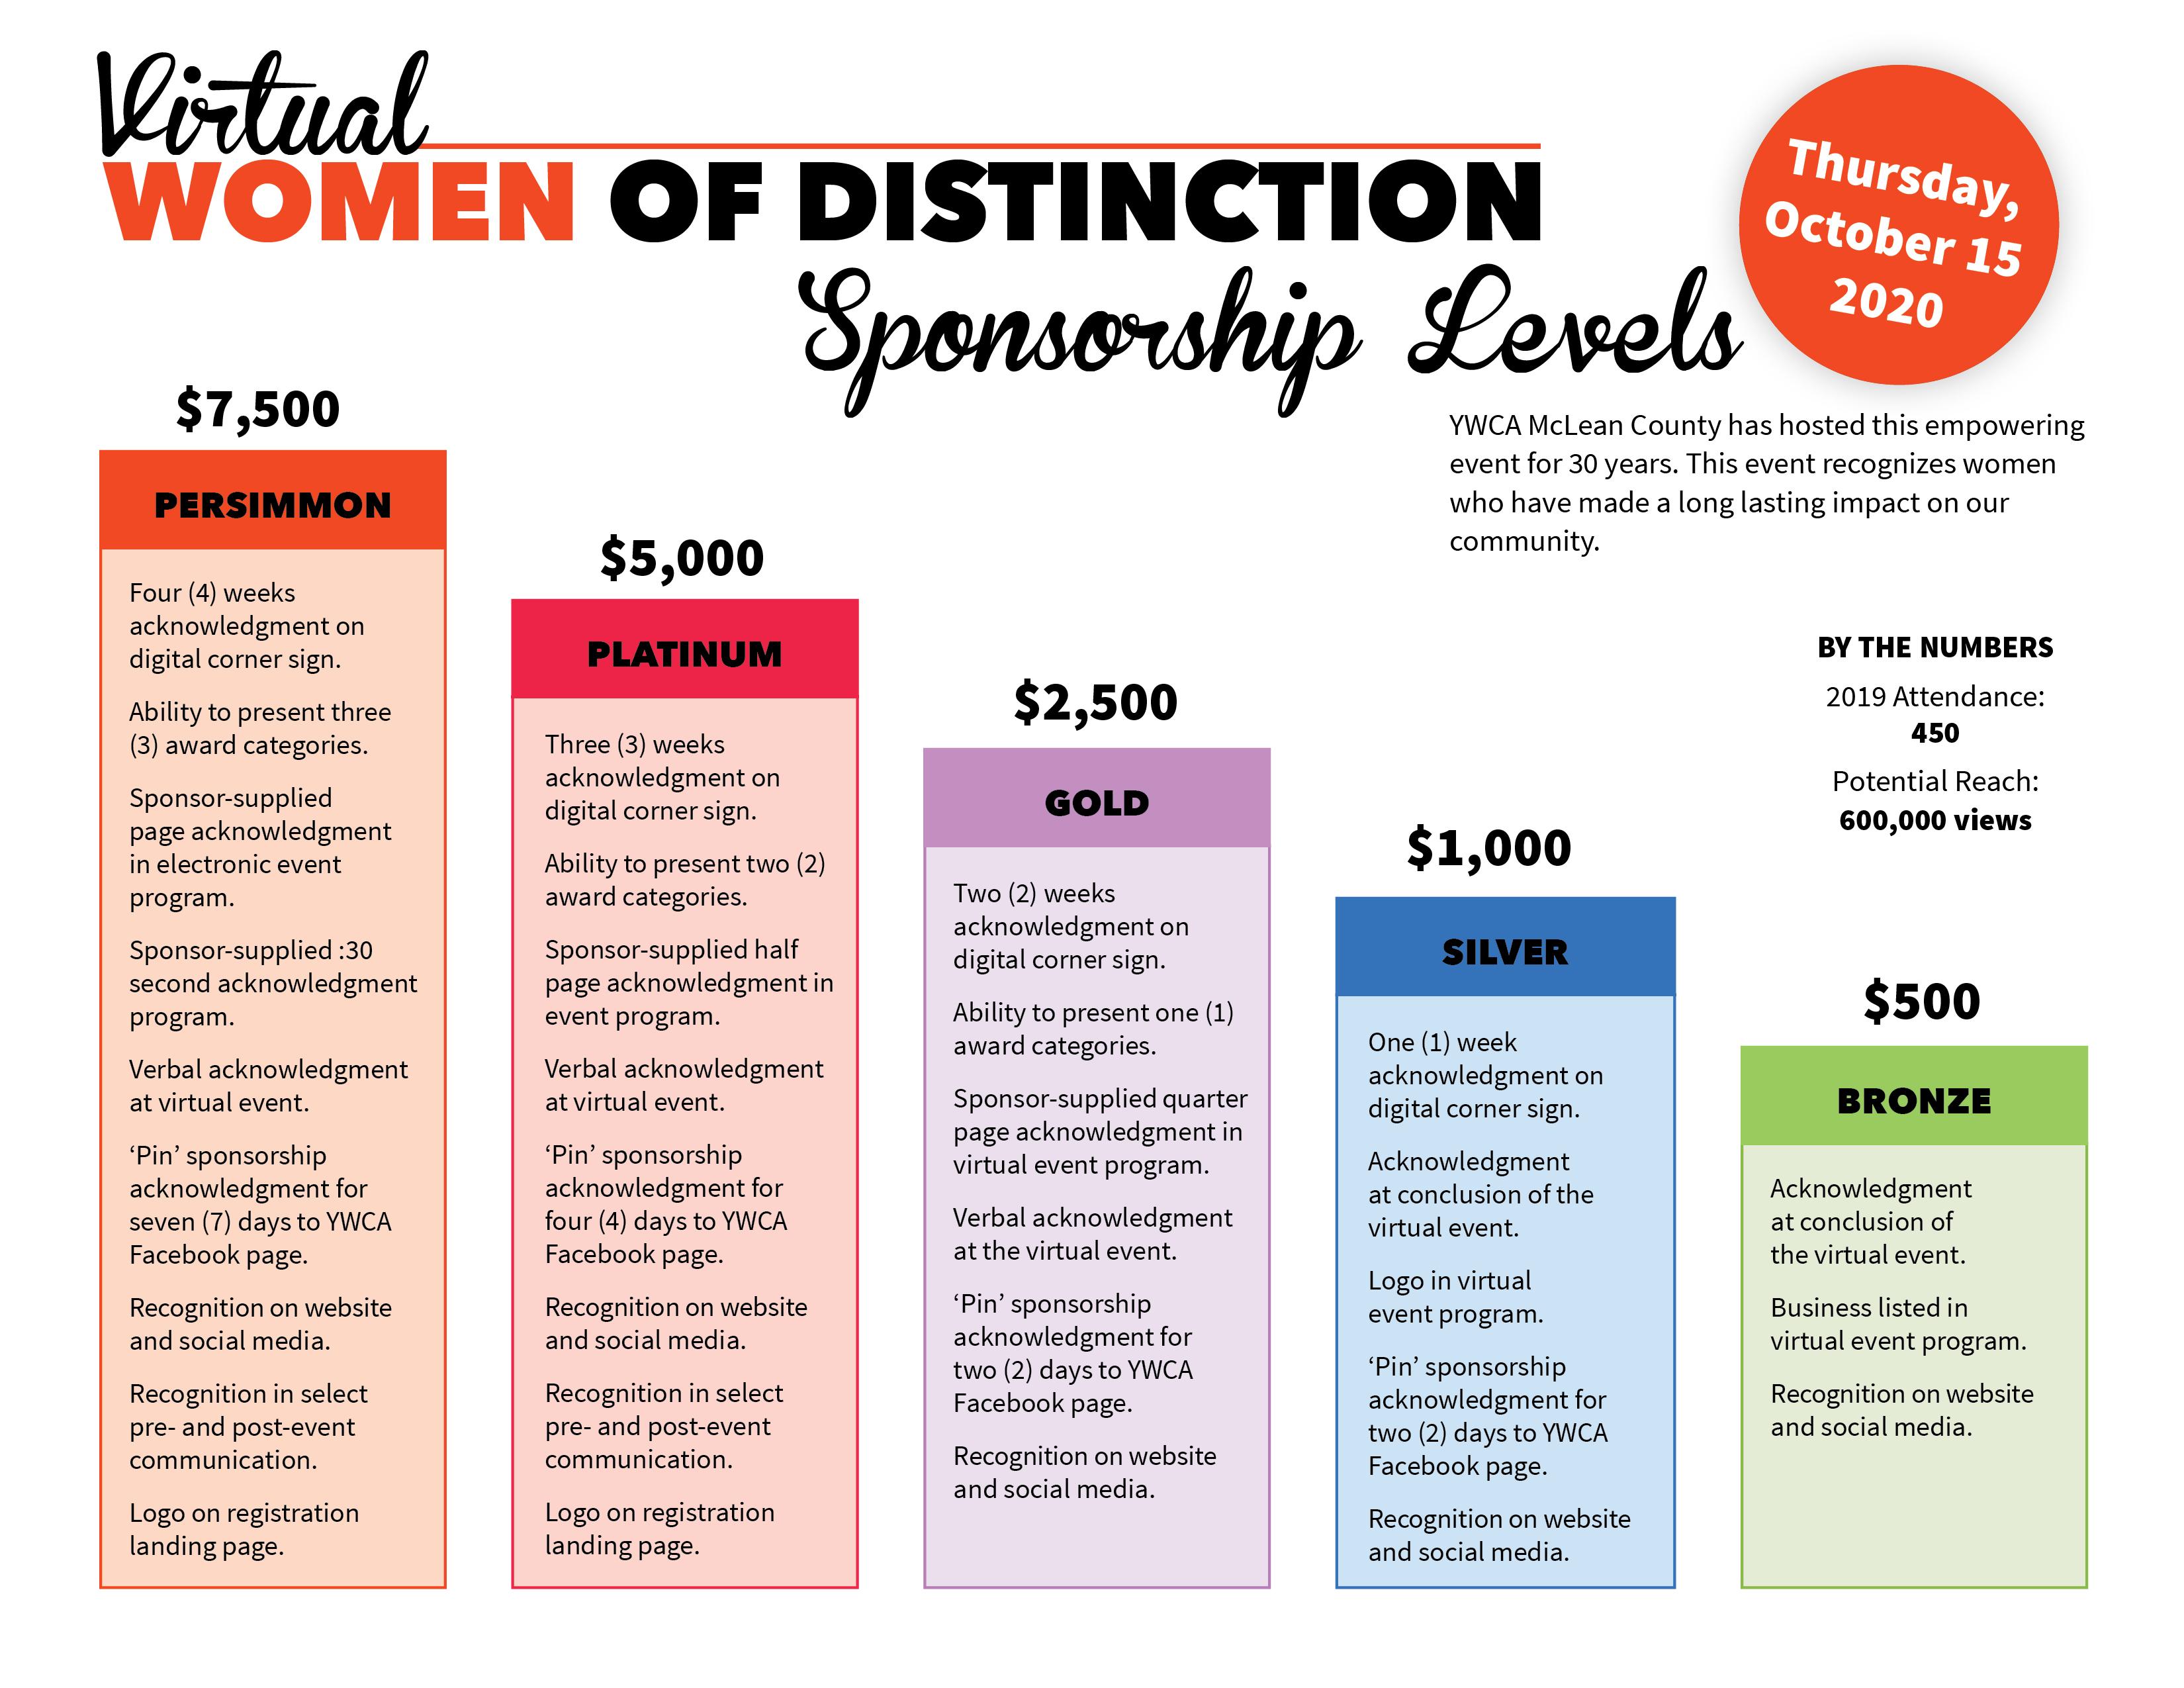 Women of Distinction Sponsorships 2020